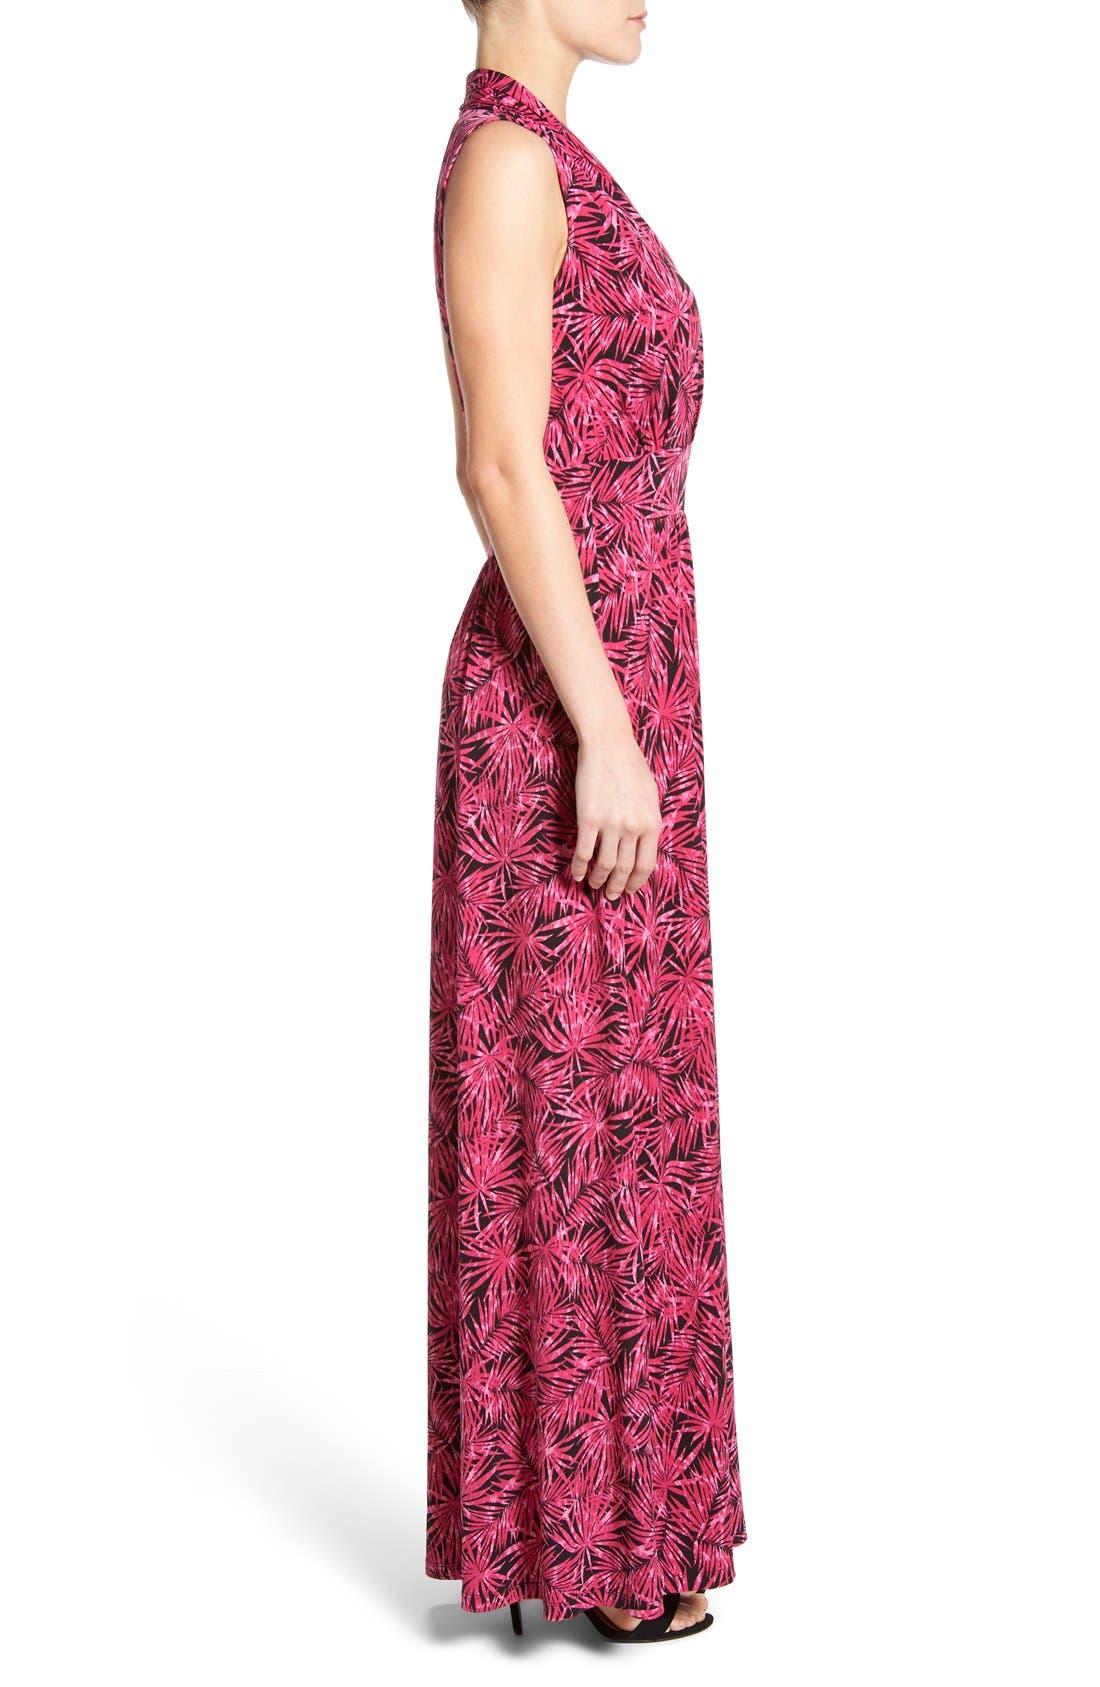 MICHAEL MICHAEL KORS, Print Jersey Side Slit Maxi Dress, Alternate thumbnail 3, color, 660